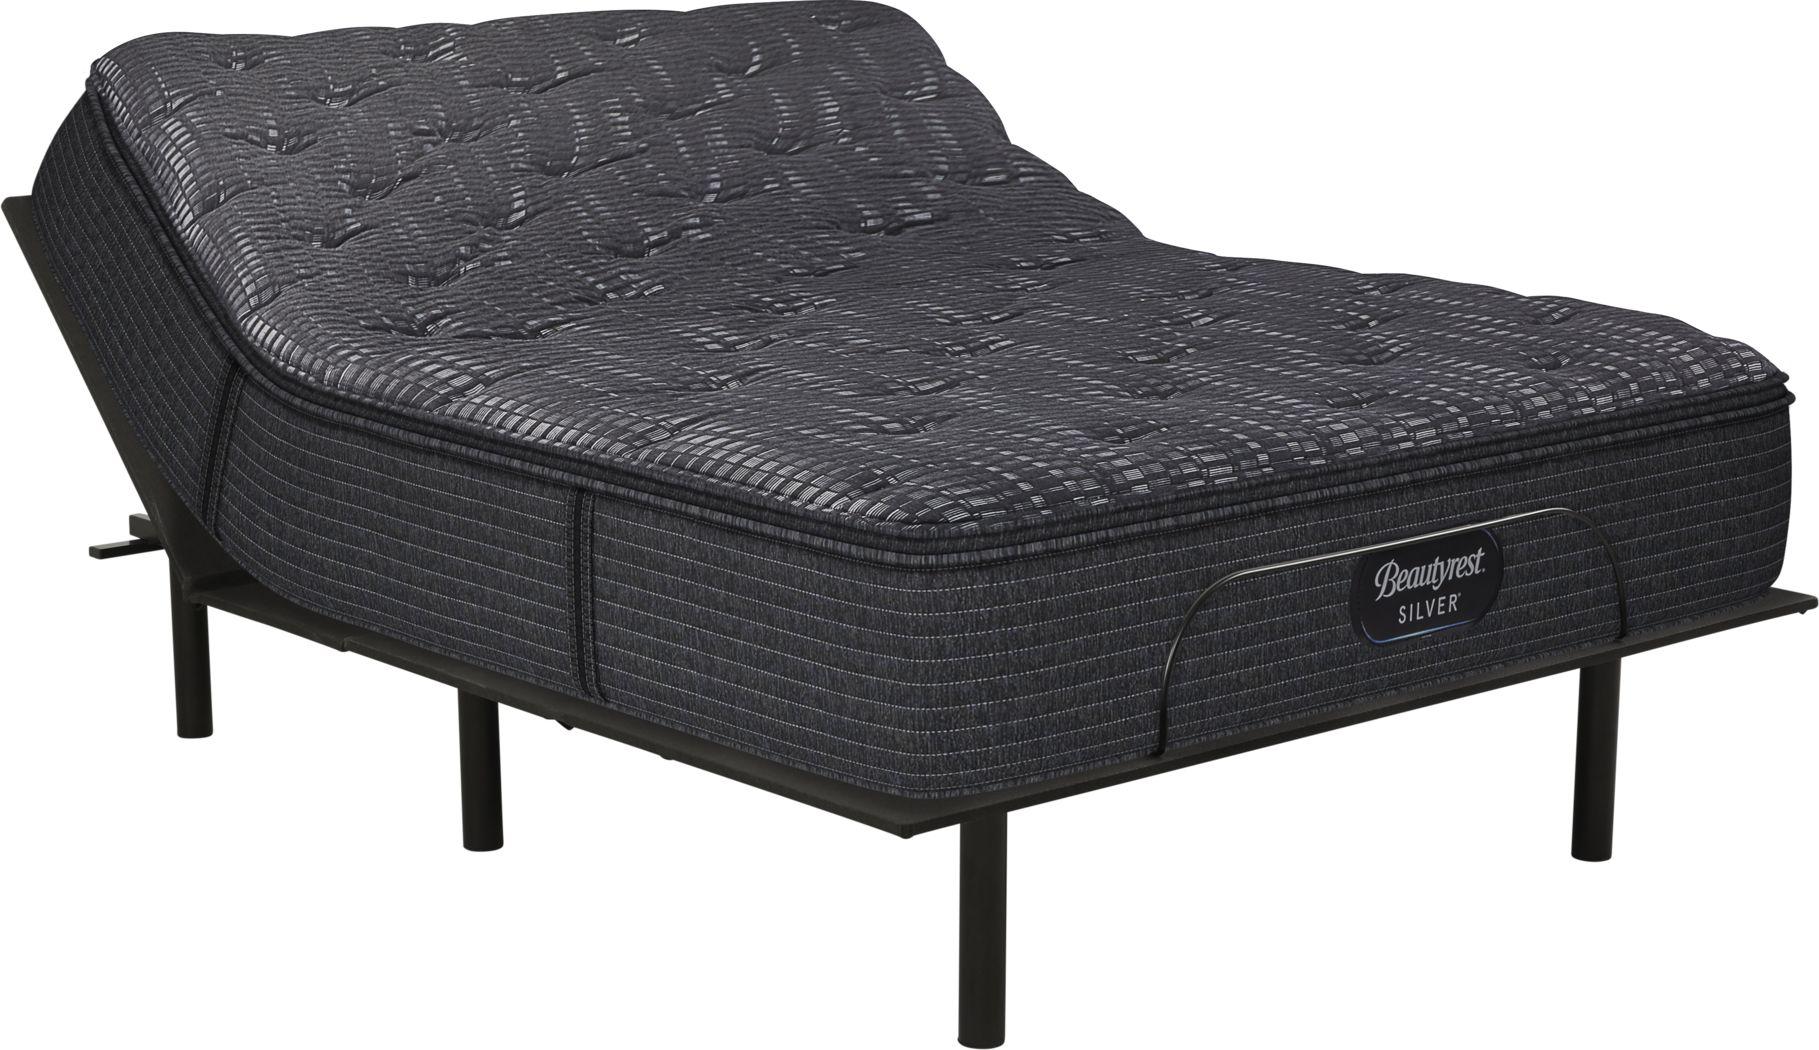 Beautyrest Silver Summerdale Queen Mattress with RTG Sleep 2000 Adjustable Base